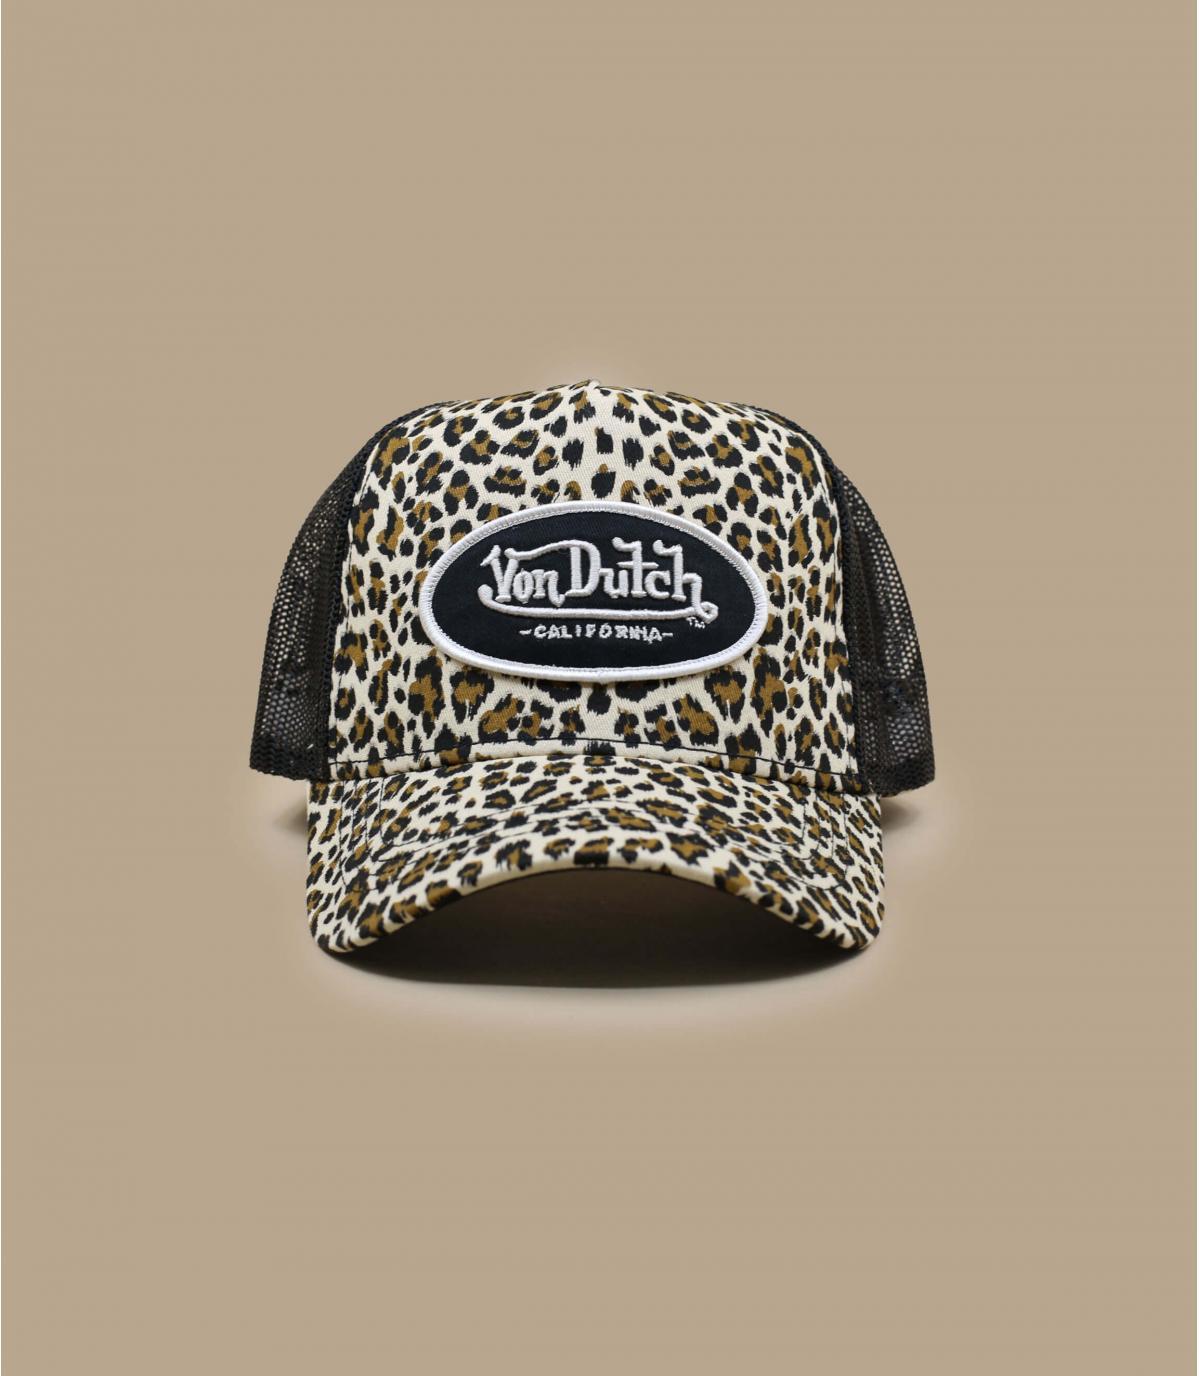 Dettagli Trucker Leopard - image 2